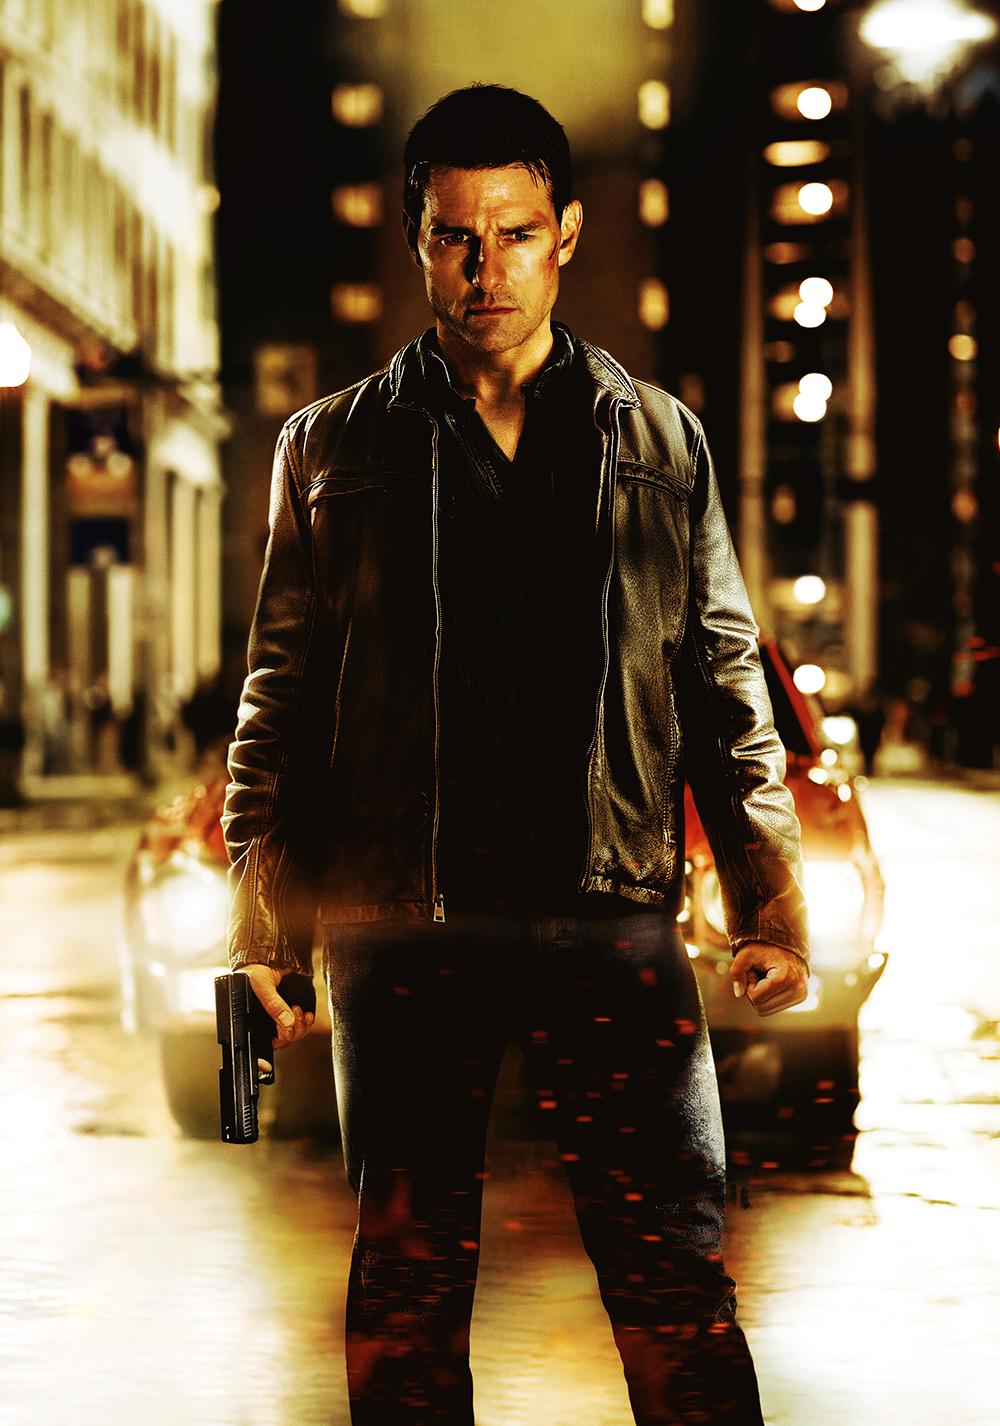 Jack Reacher Movie4k